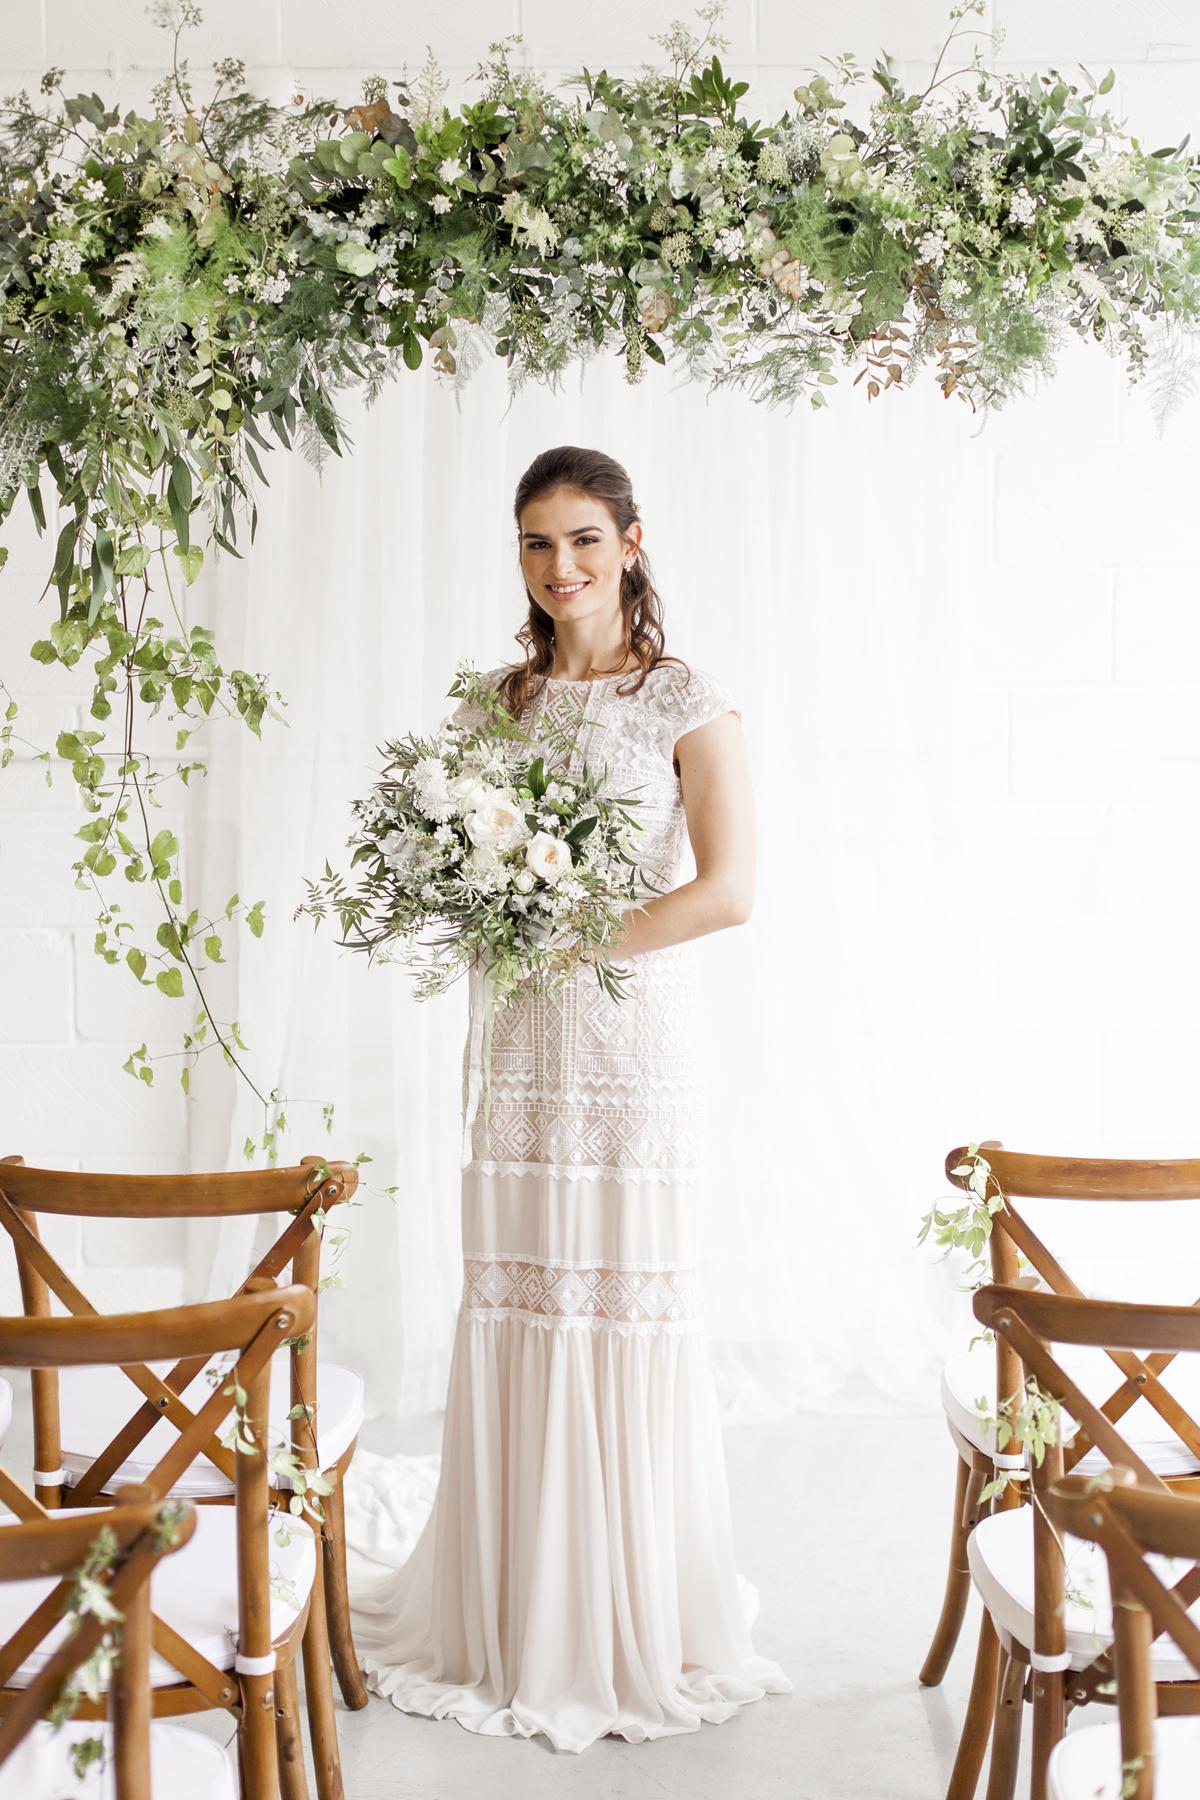 Image - Helen Warner Photography | Florals - Moss & Stone Floral Design